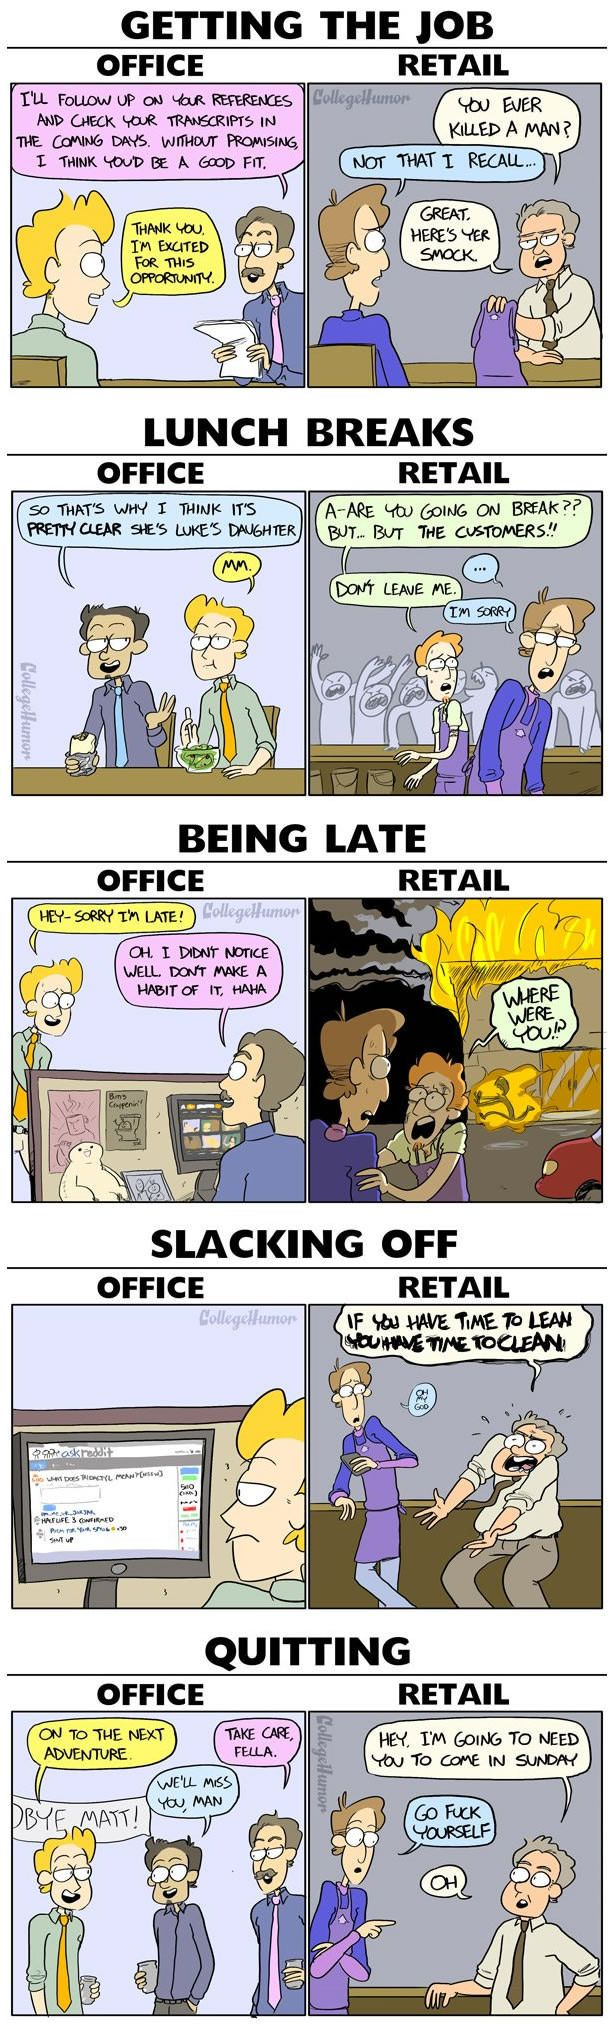 best ideas about retail sucks workplace office vs retail jobs